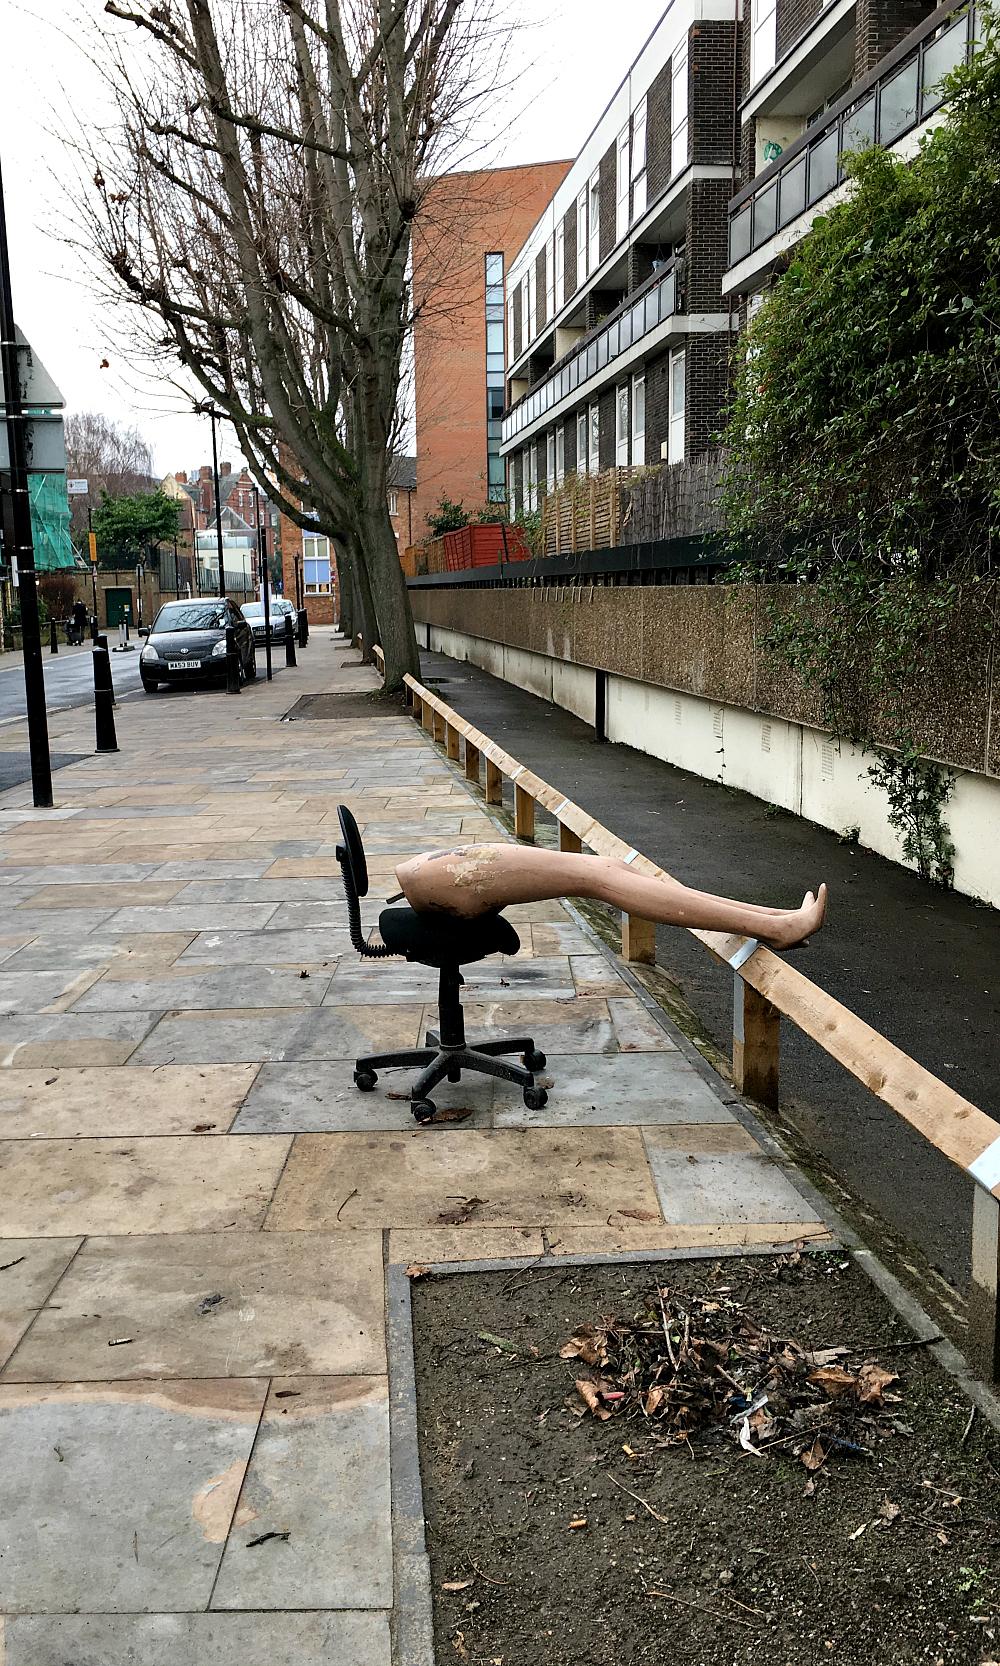 Credit: Yasumi    Location: Bethnal Green, London